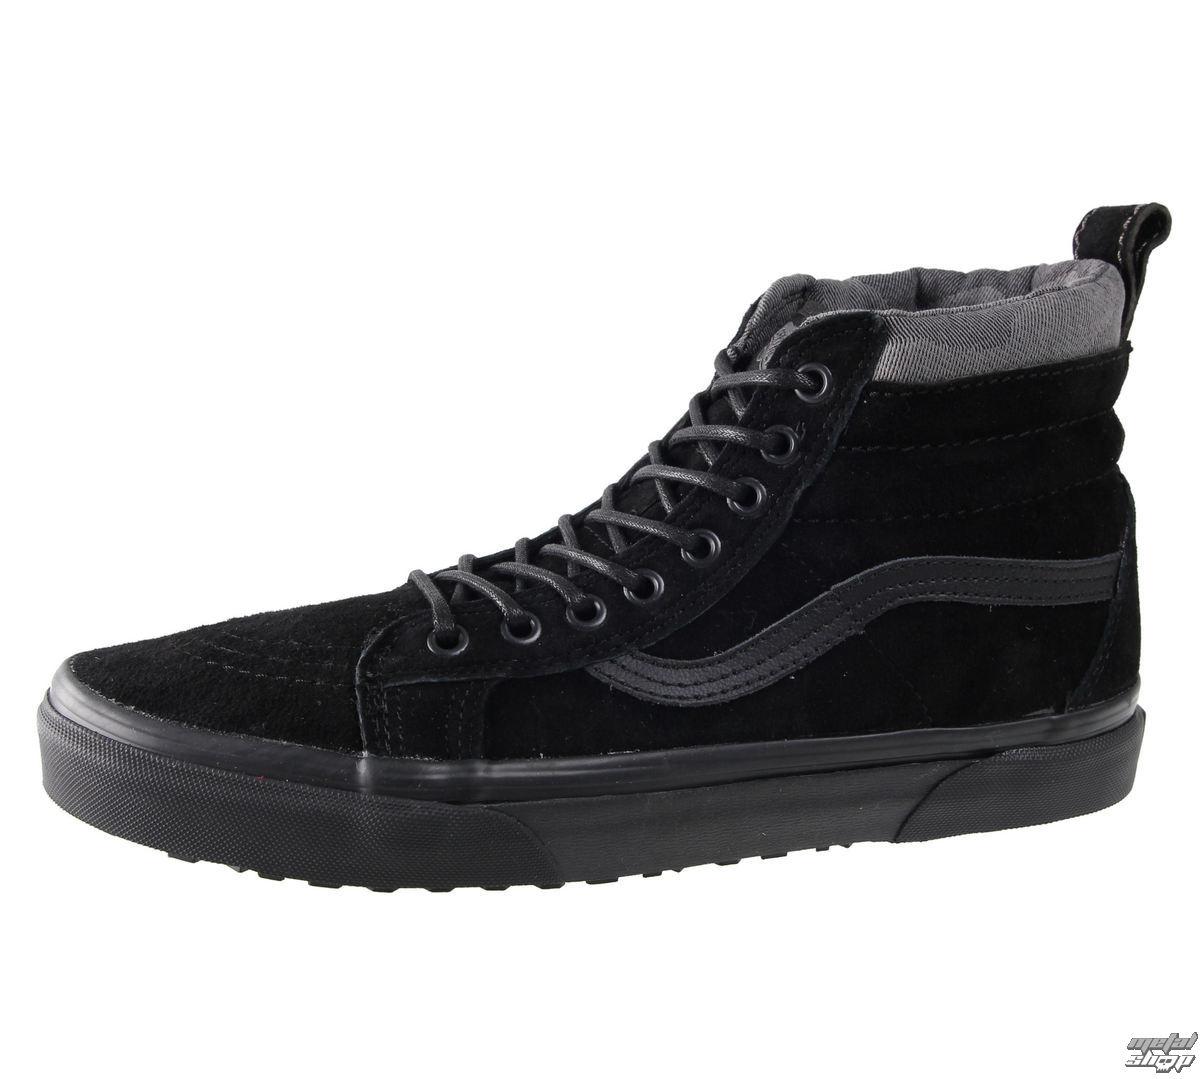 topánky VANS - SK8-HI-MTE - Black / Black - V00XH4JUB